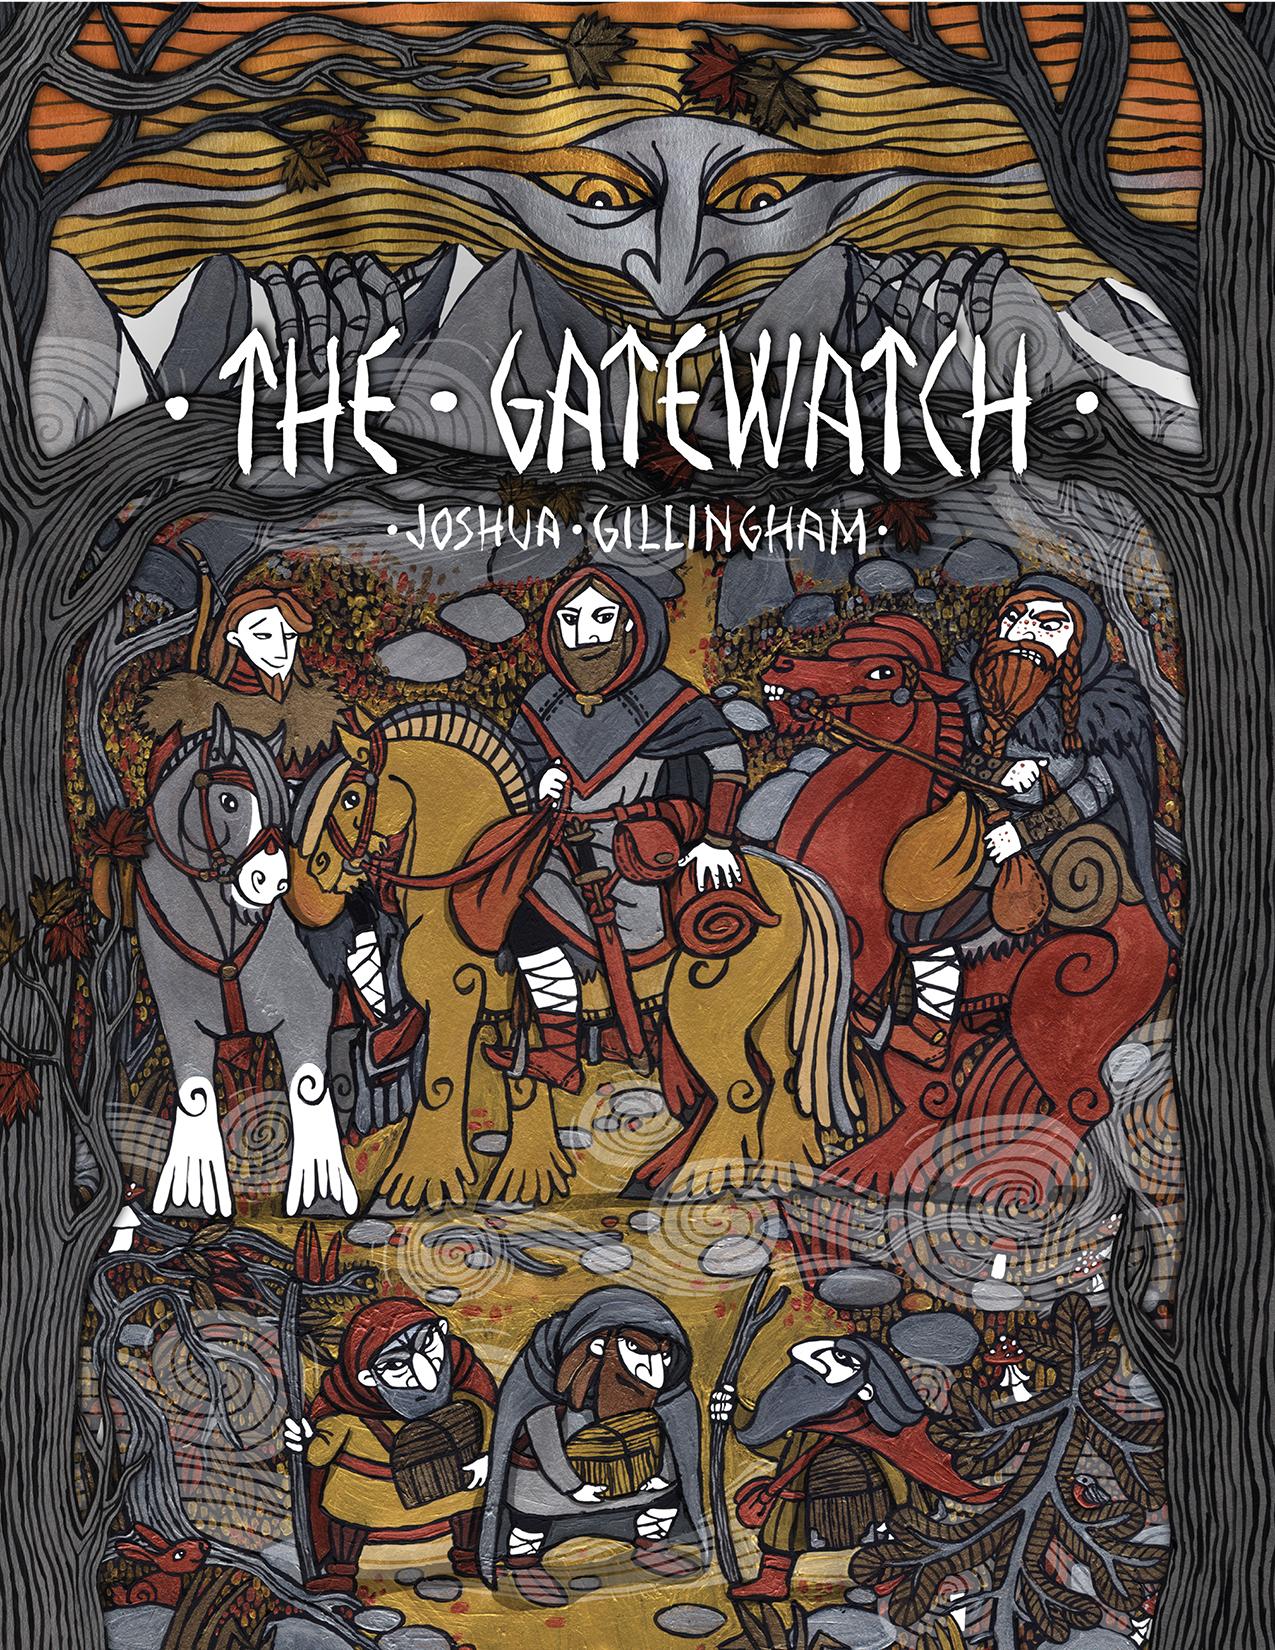 The Gatewatch